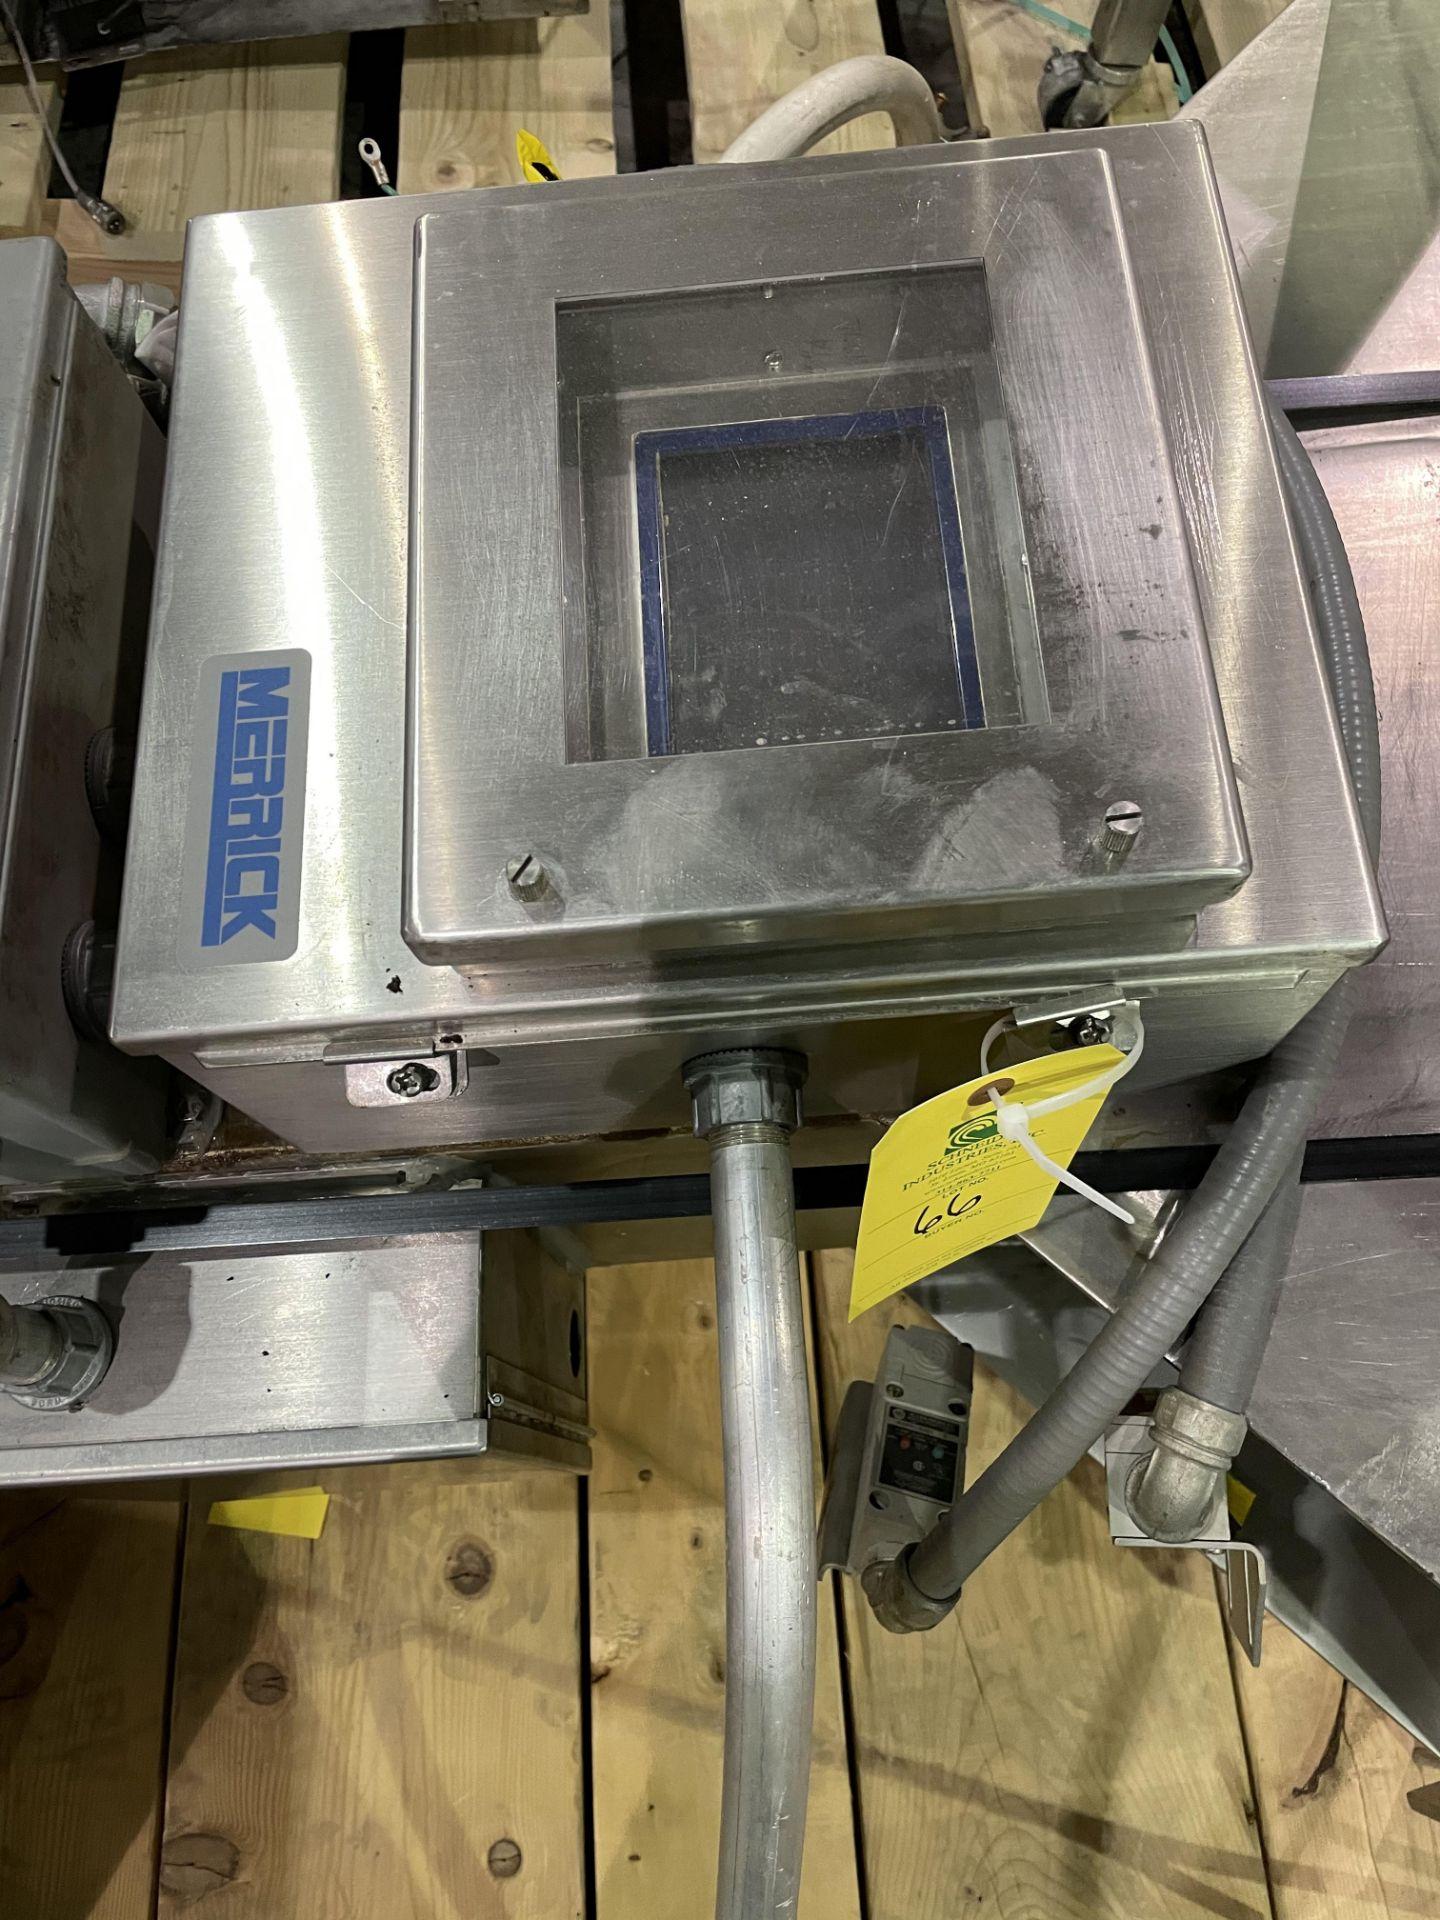 Merrick Weigh Feeder Model 970 S/N 31115 Loading/Rigging Fee $100 - Image 4 of 5